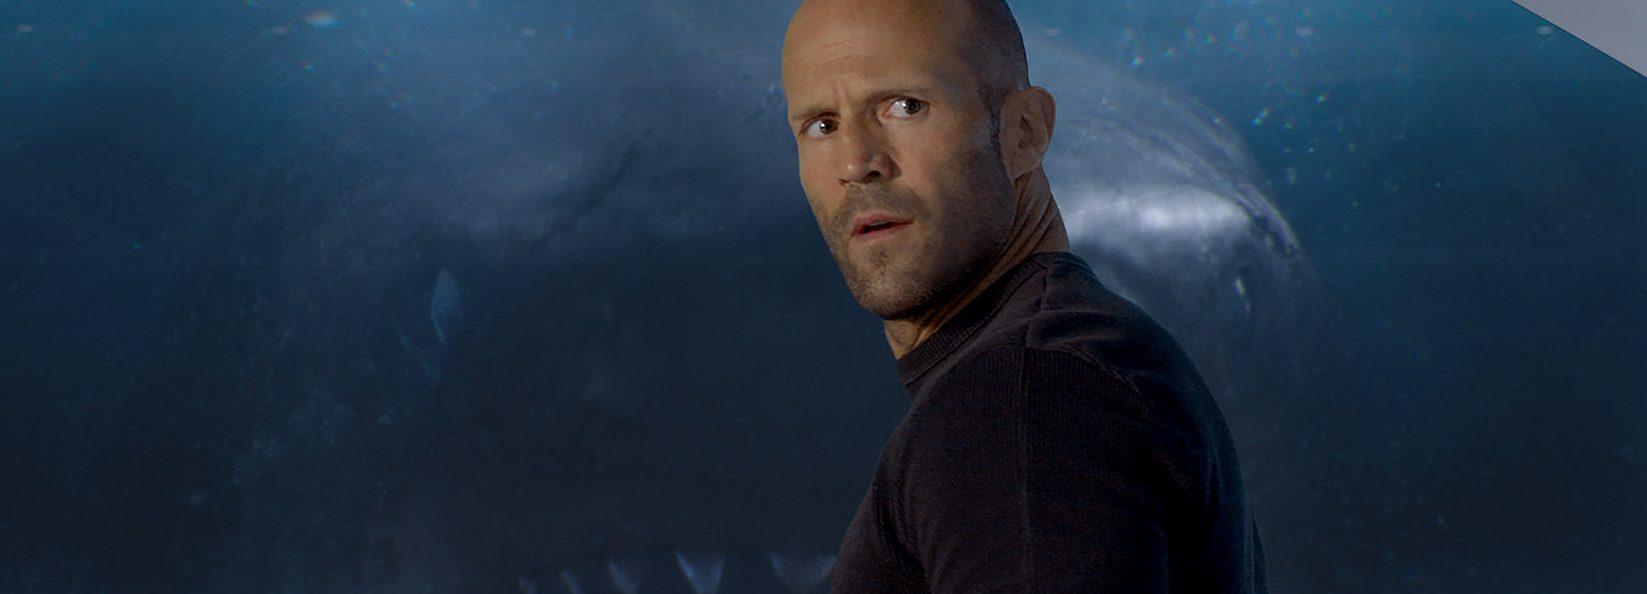 "Jason Statham stars in ""The Meg."" (Warner Bros. Pictures)"